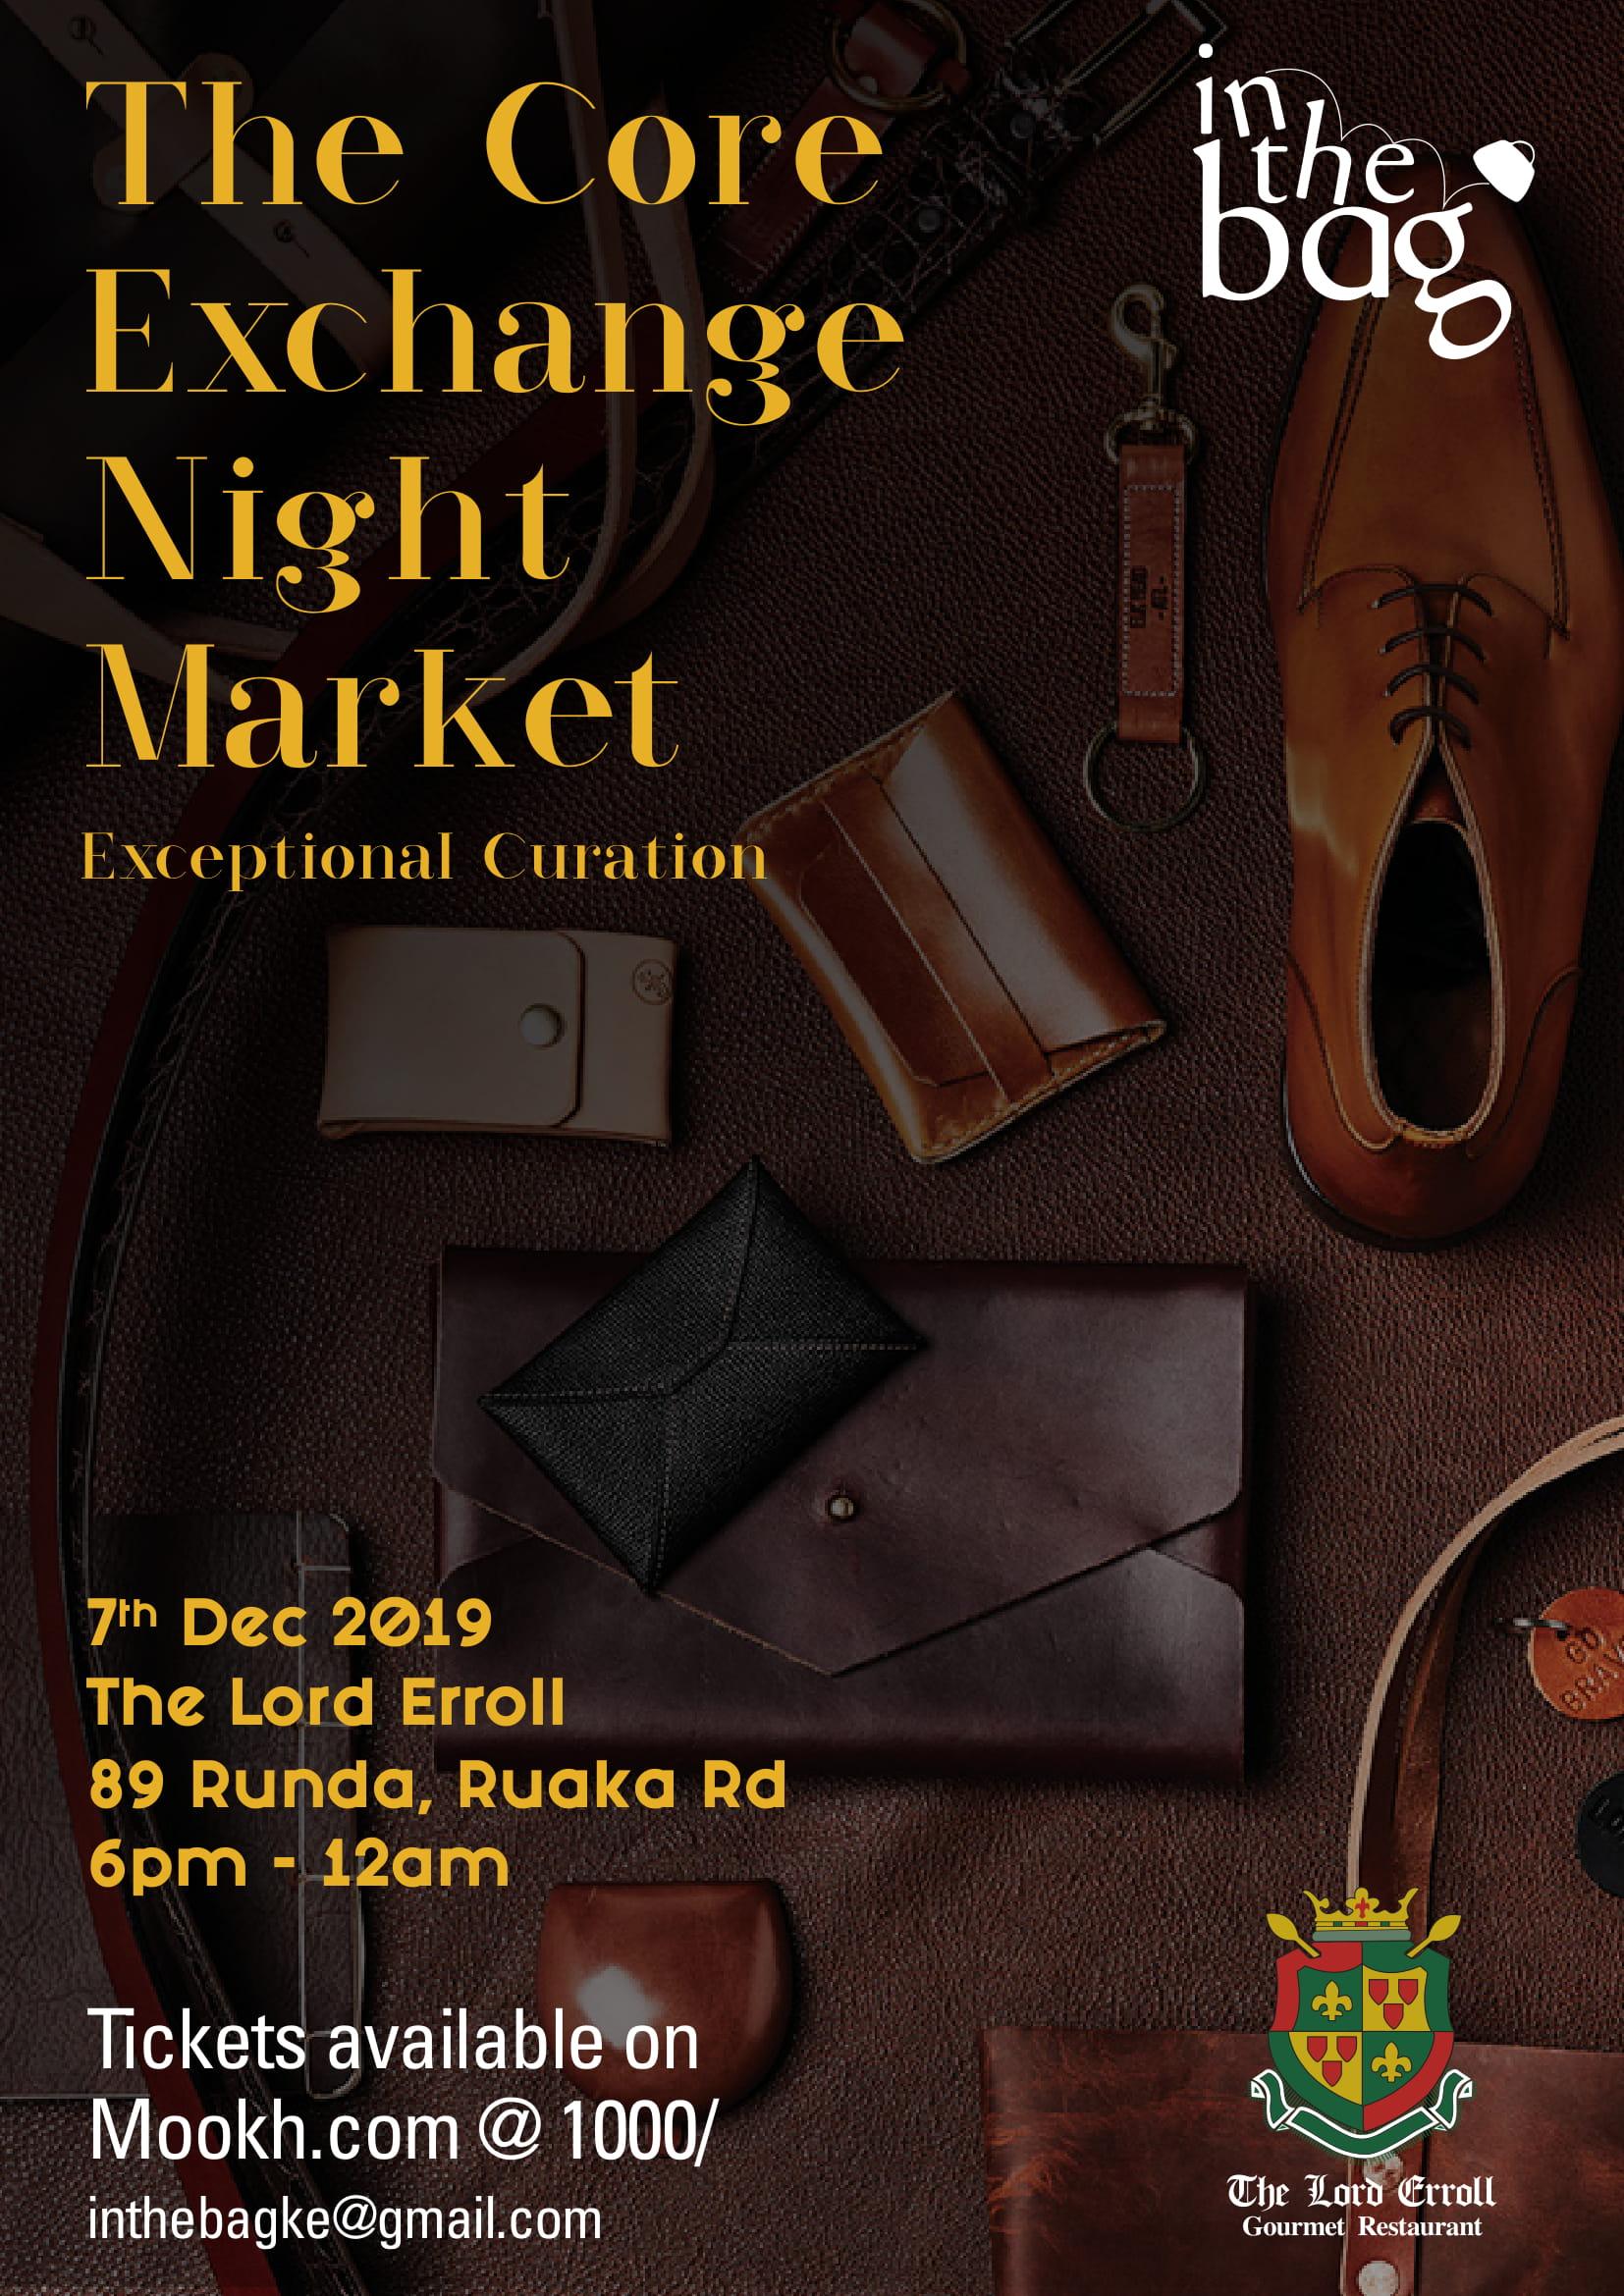 The Core Exchange Night Market